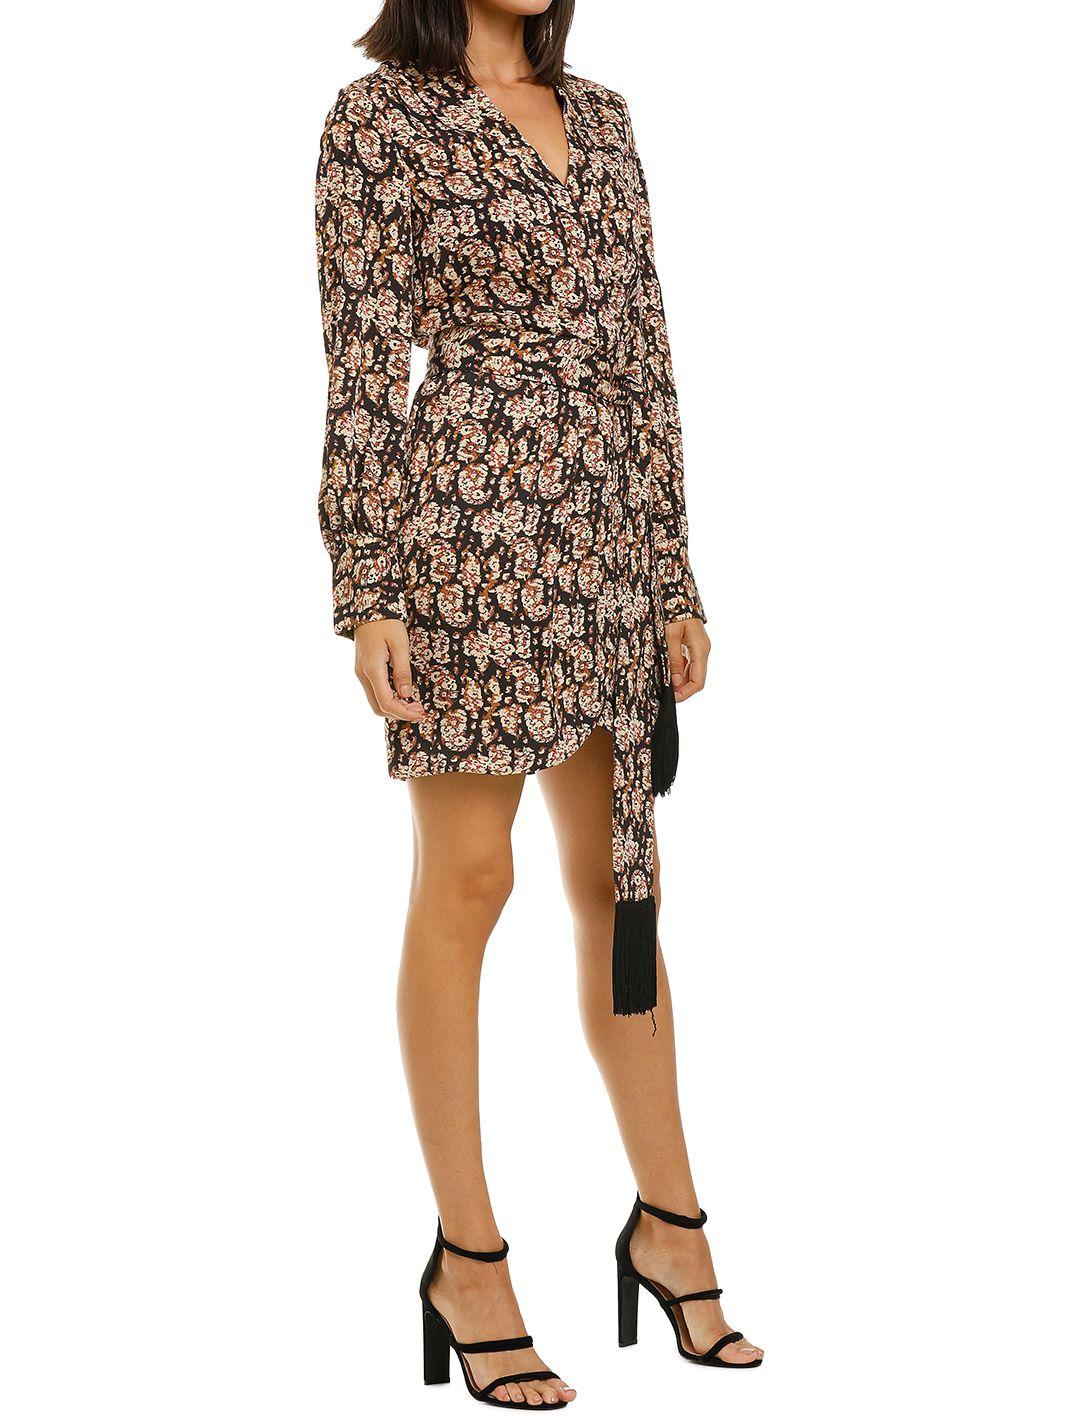 Rebecca-Vallance-Josephine-LS-Mini-Dress-Print-Side